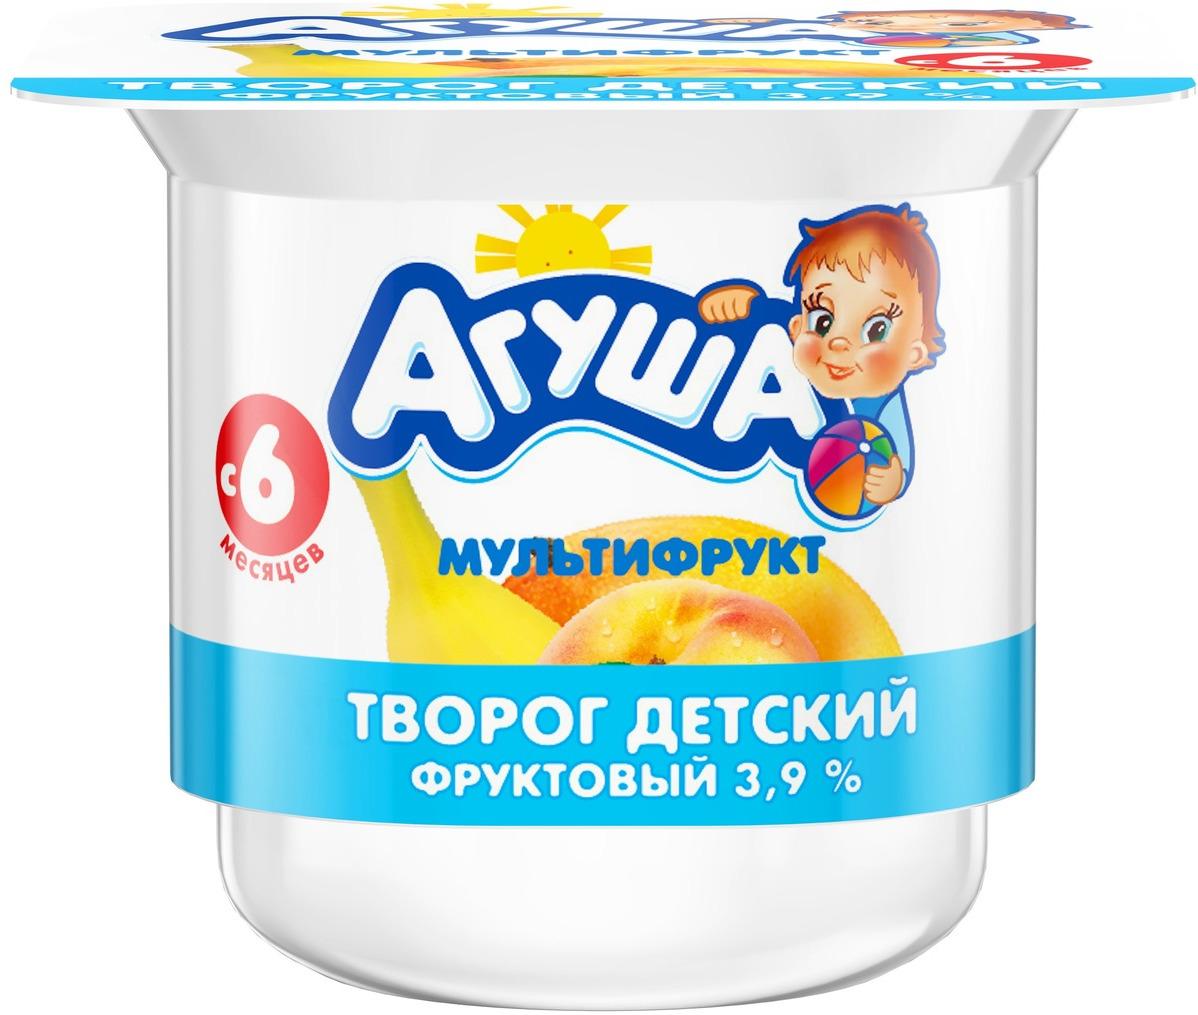 Творог фруктовый 3,9% с 6 месяцев Агуша Мультифрукт, 100 г